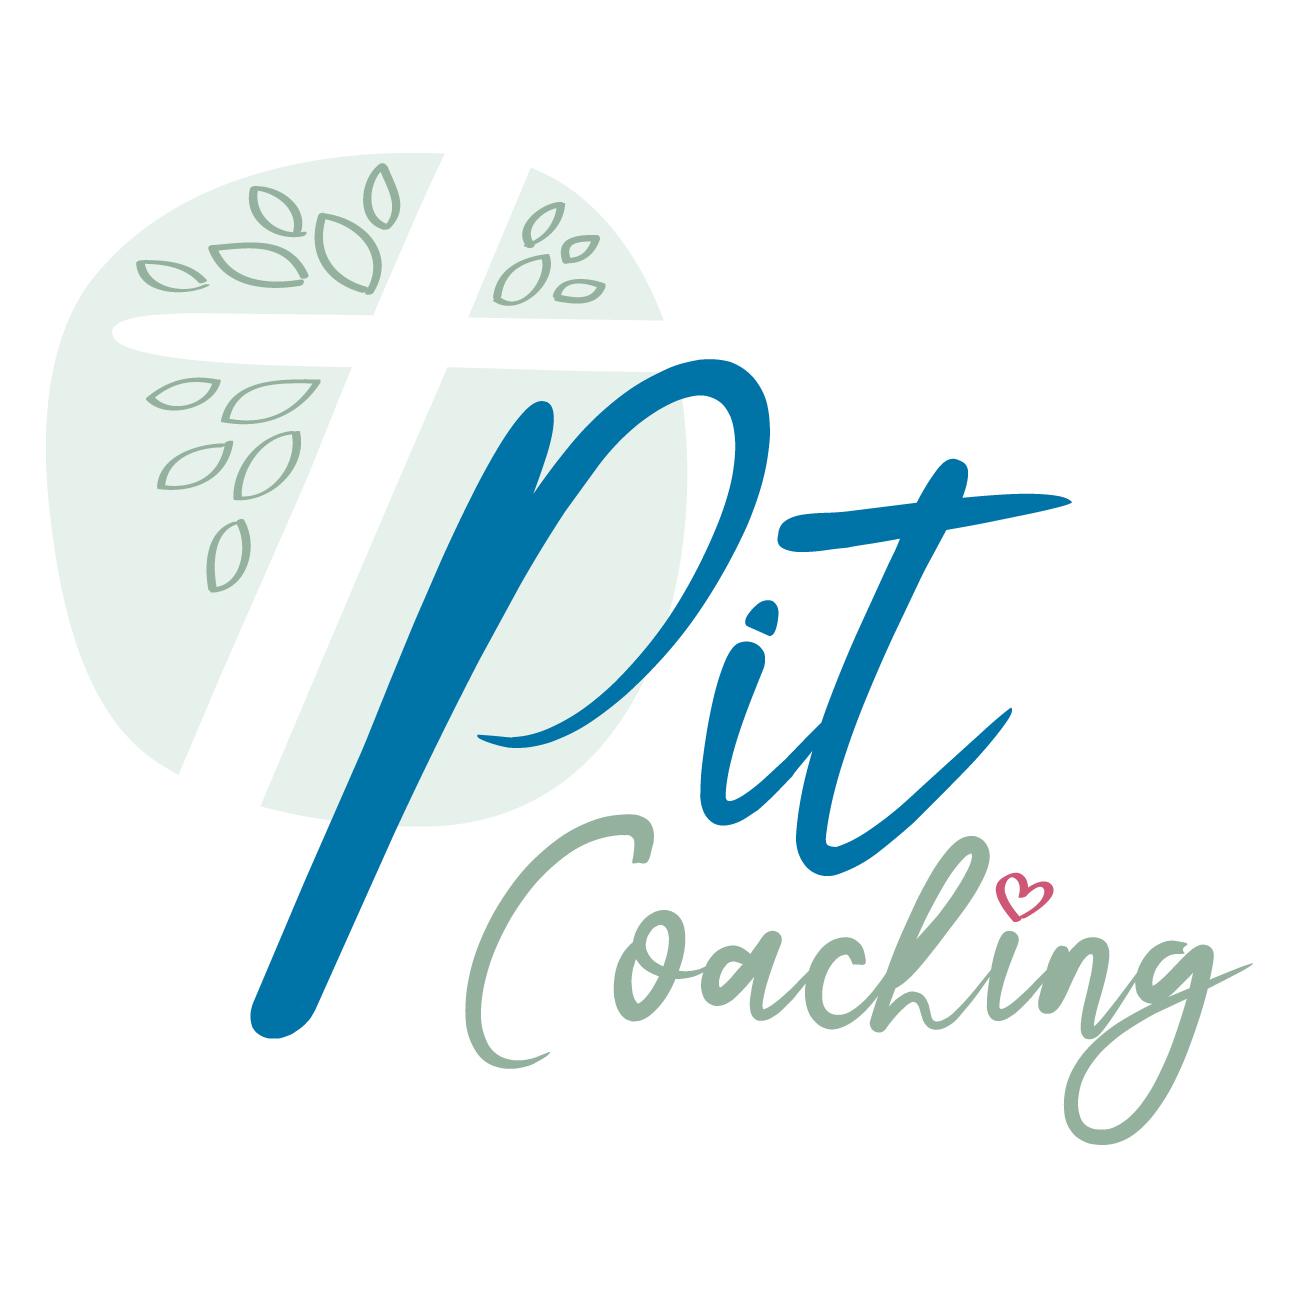 Pit Coaching